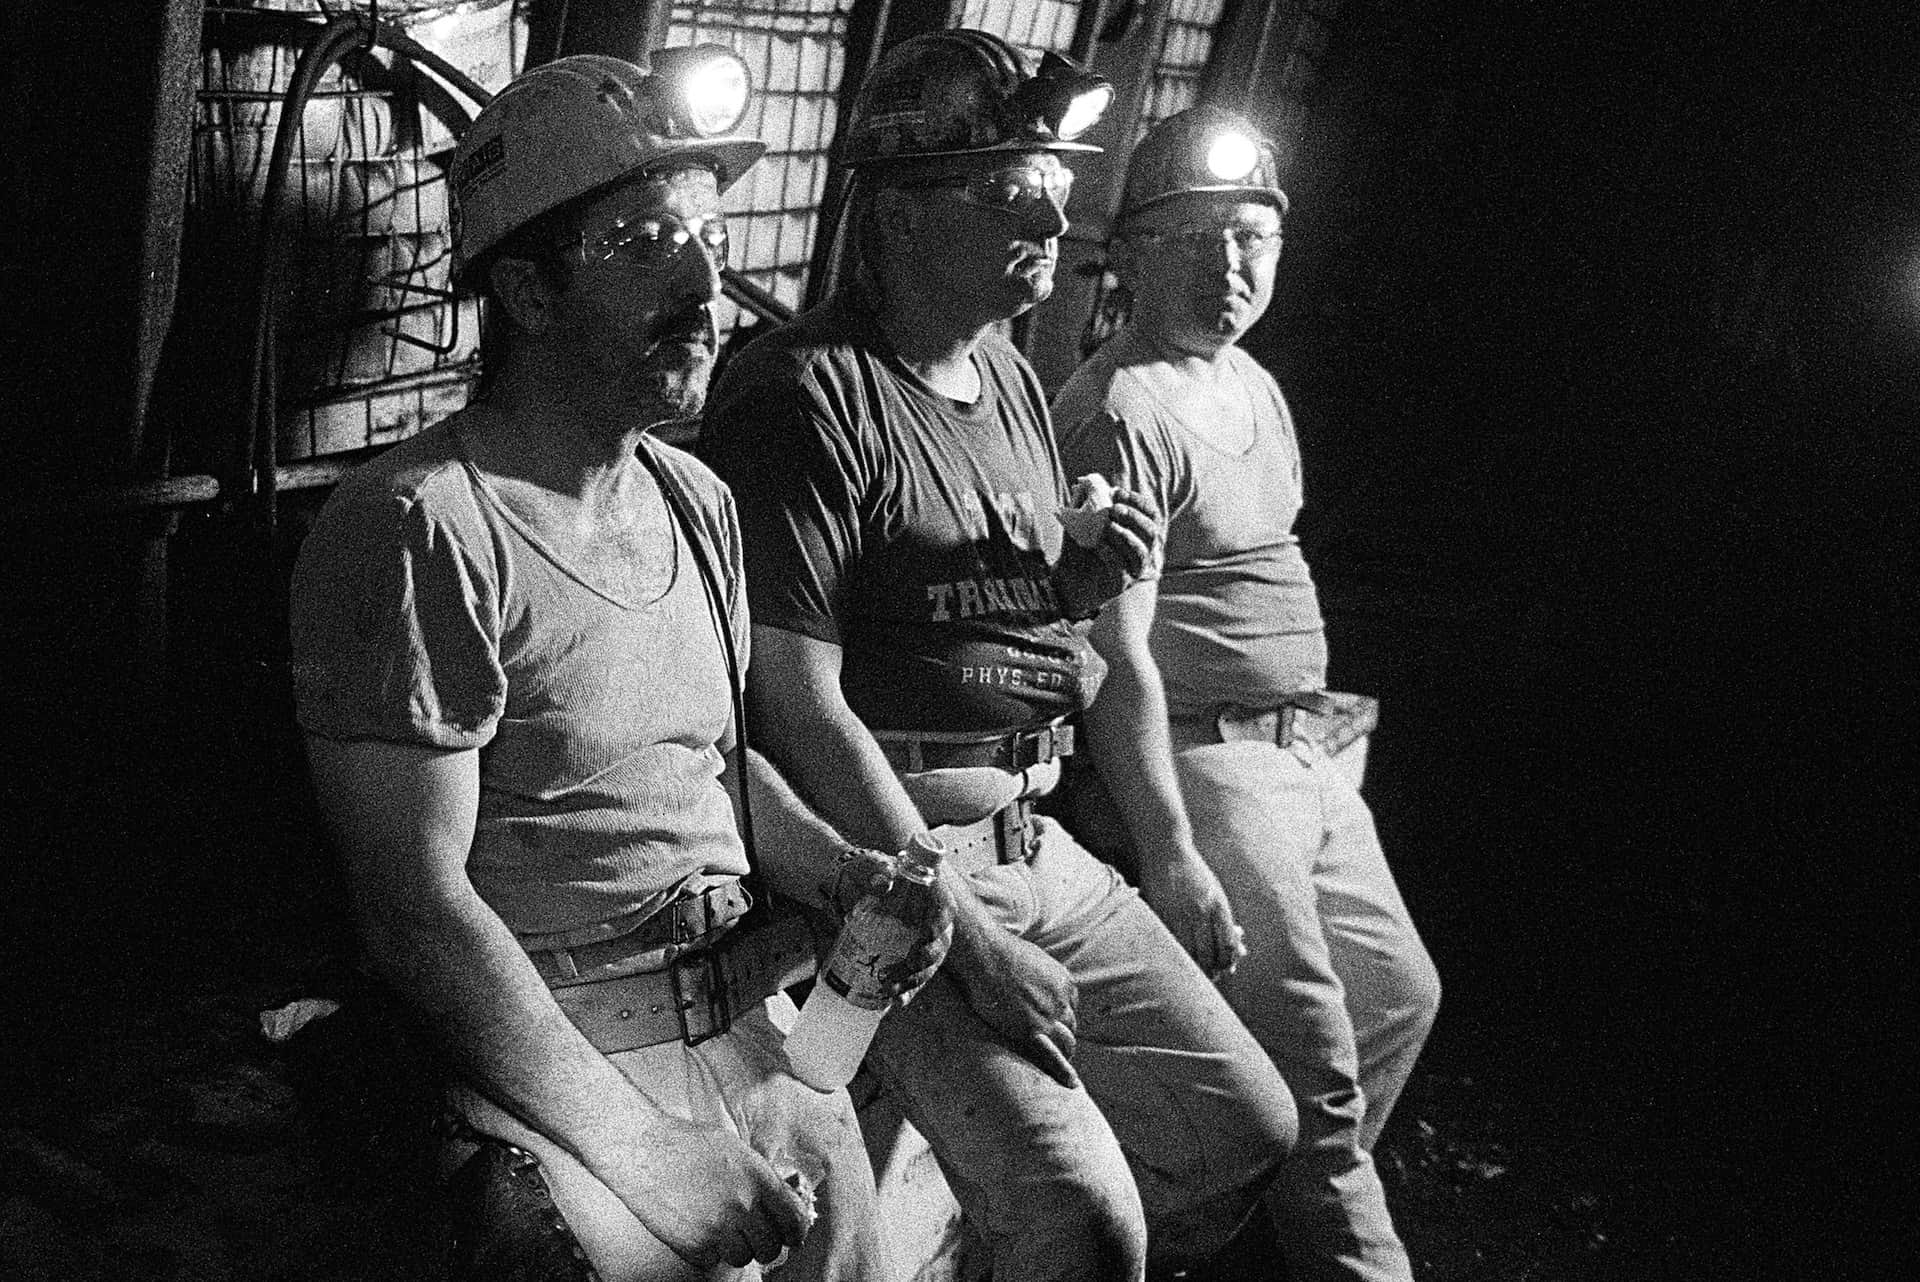 Bergleute in Zeche Prosper Haniel